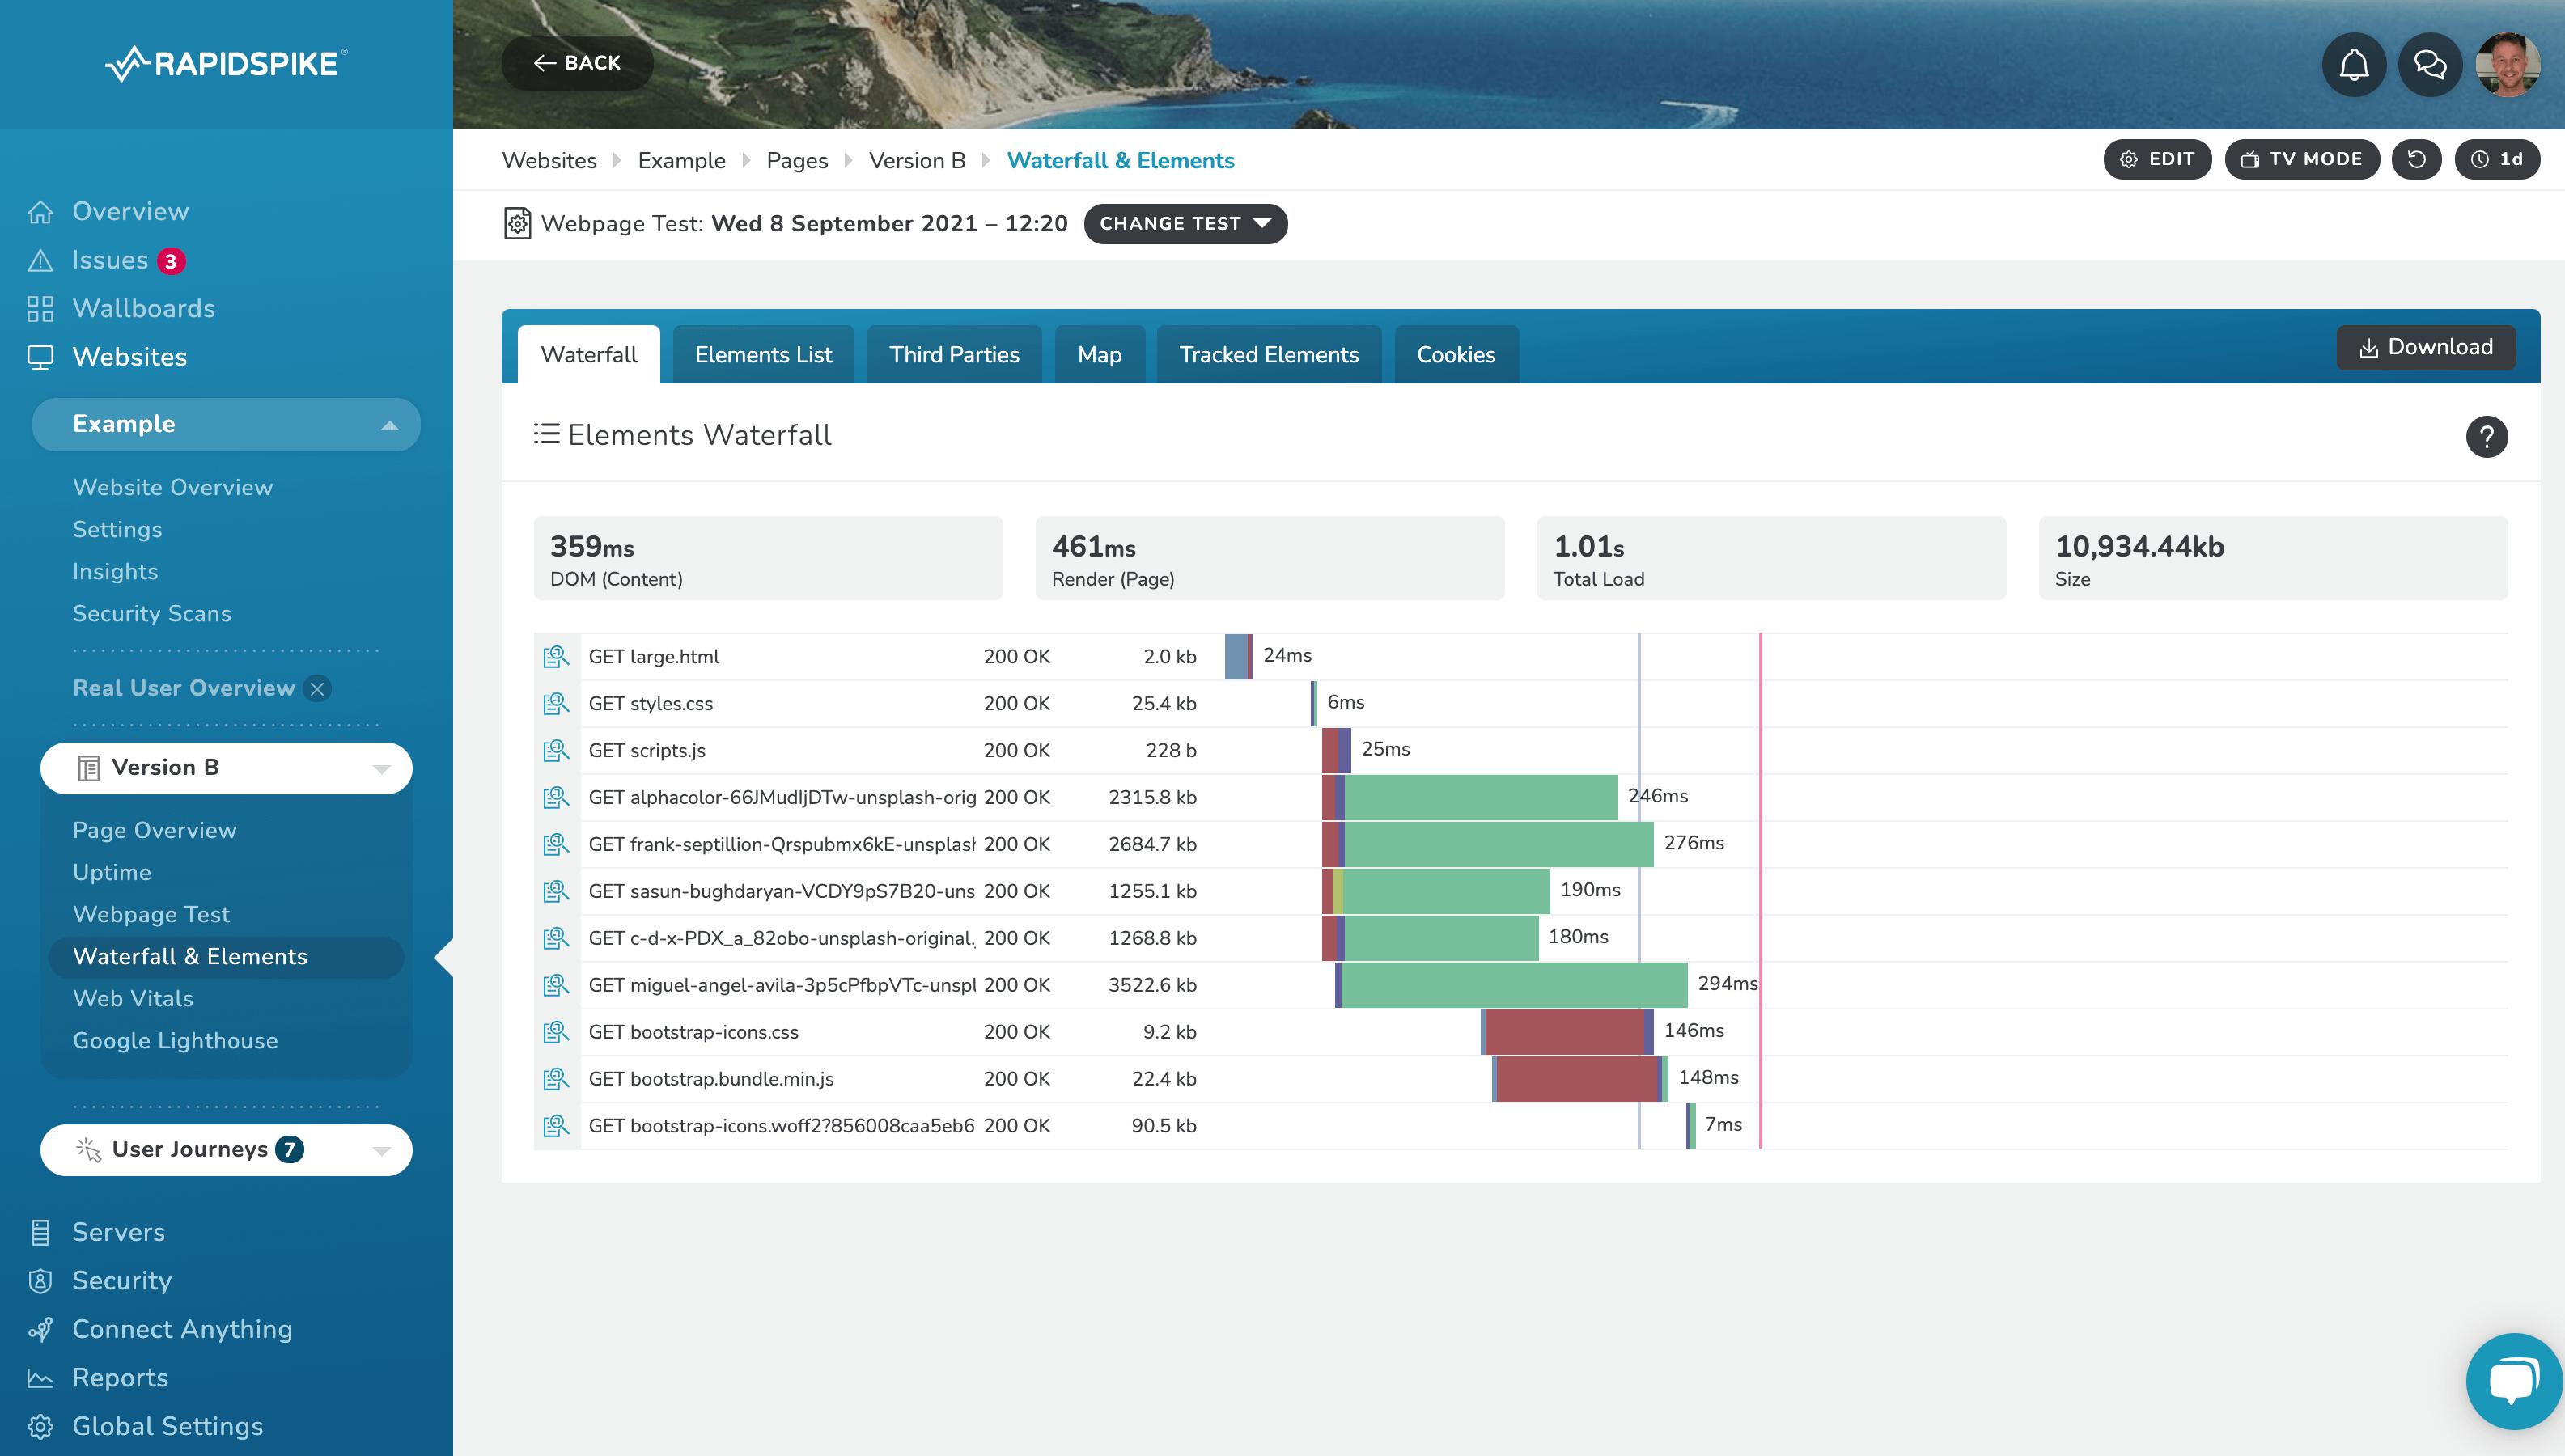 RapidSpike Webpage Test